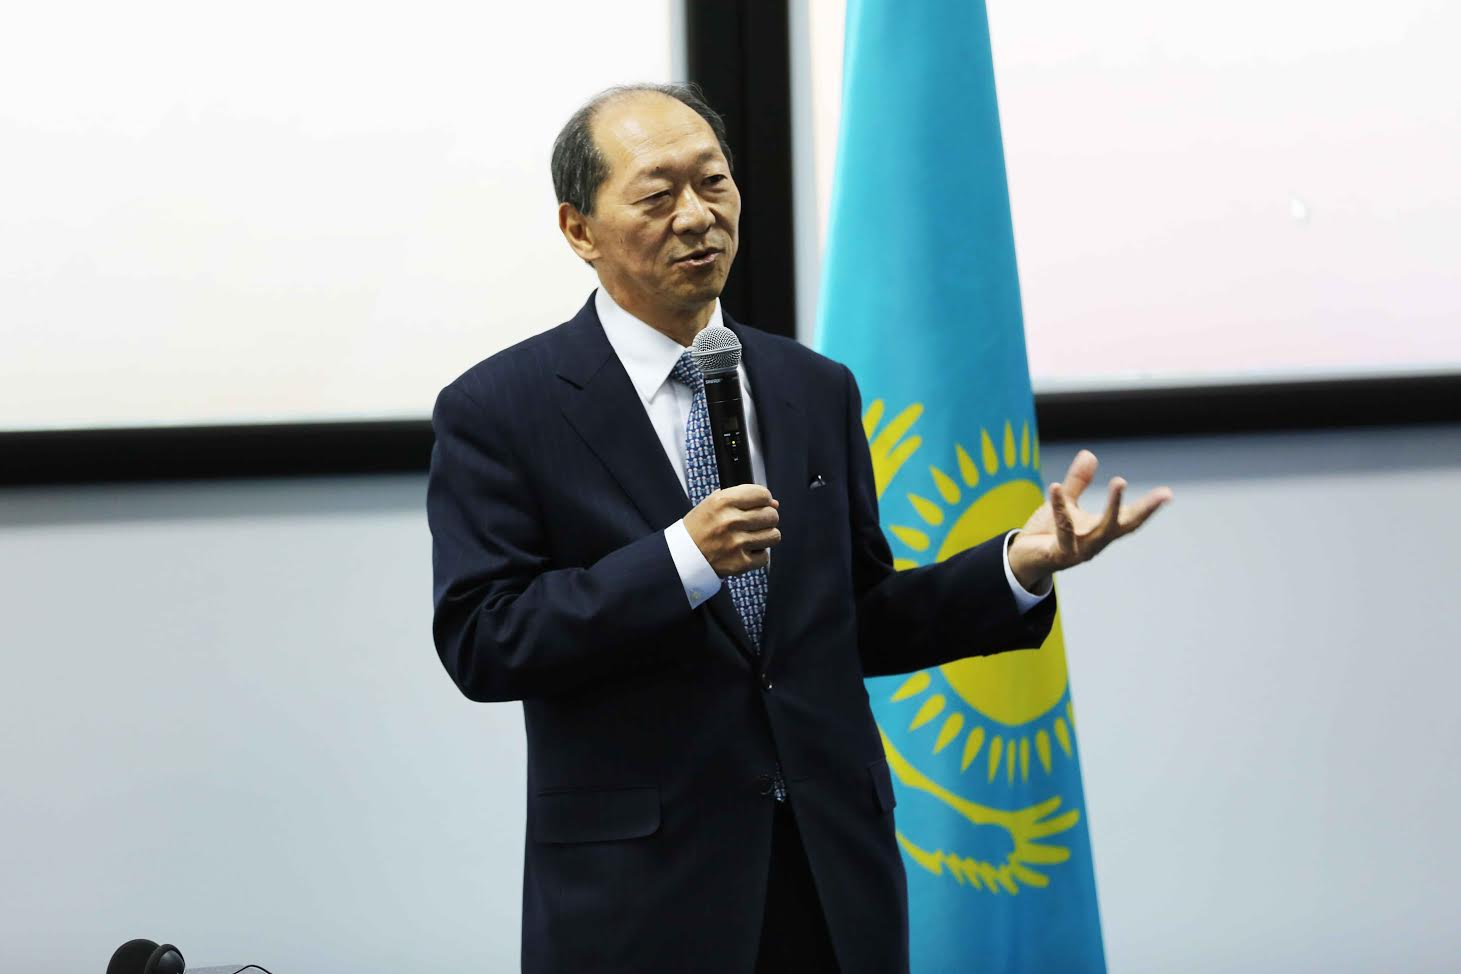 IMAGES : Le Président Macky Sall à l'Université Nazarbayev